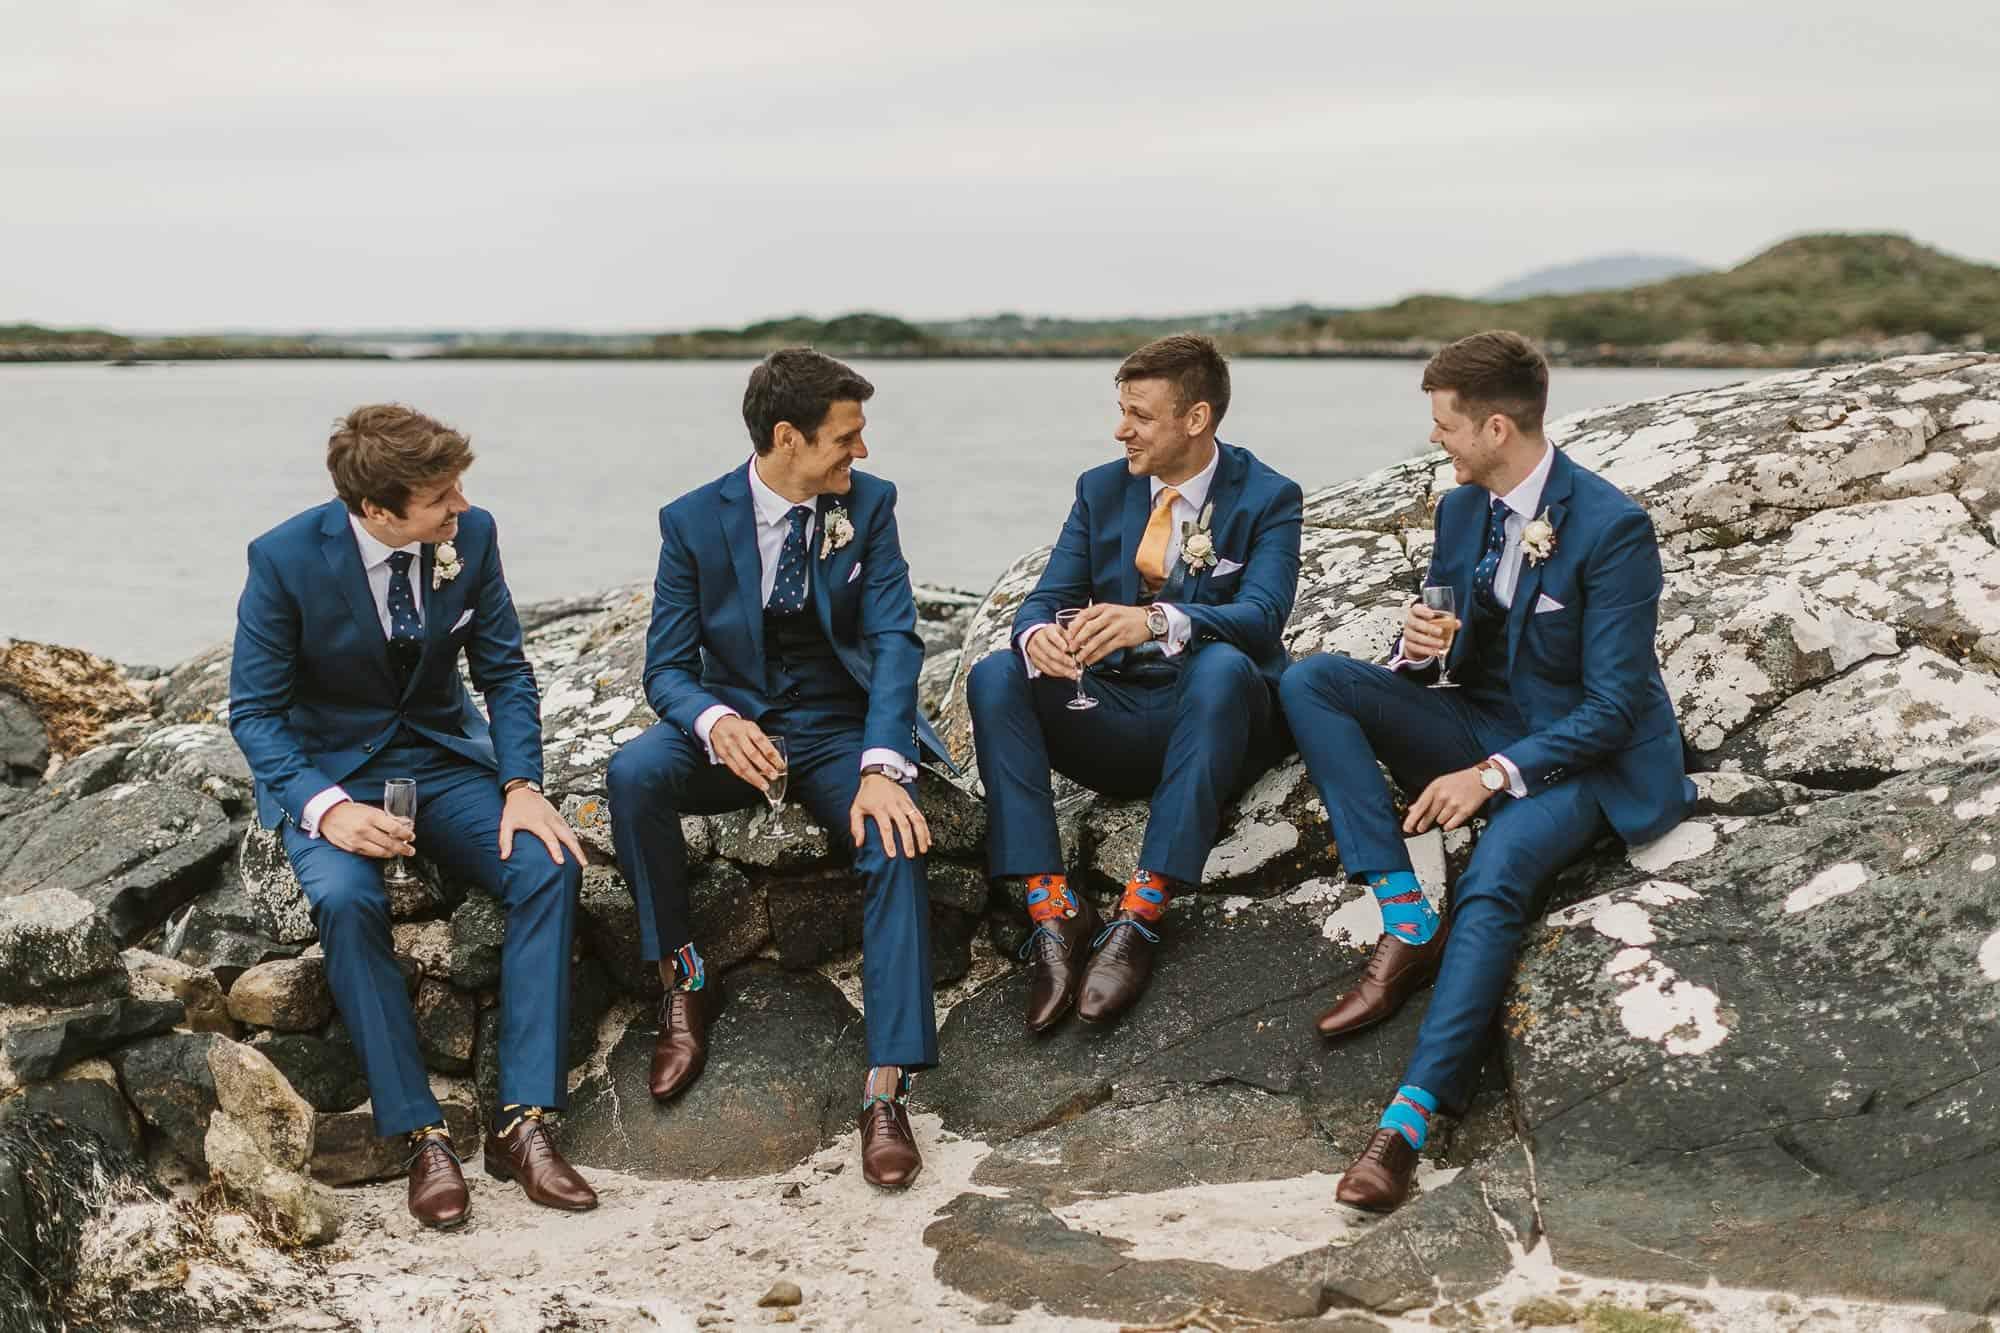 Elopement Ireland Connemara Having Fun with the boys, groomsmen are chatting on the rocks